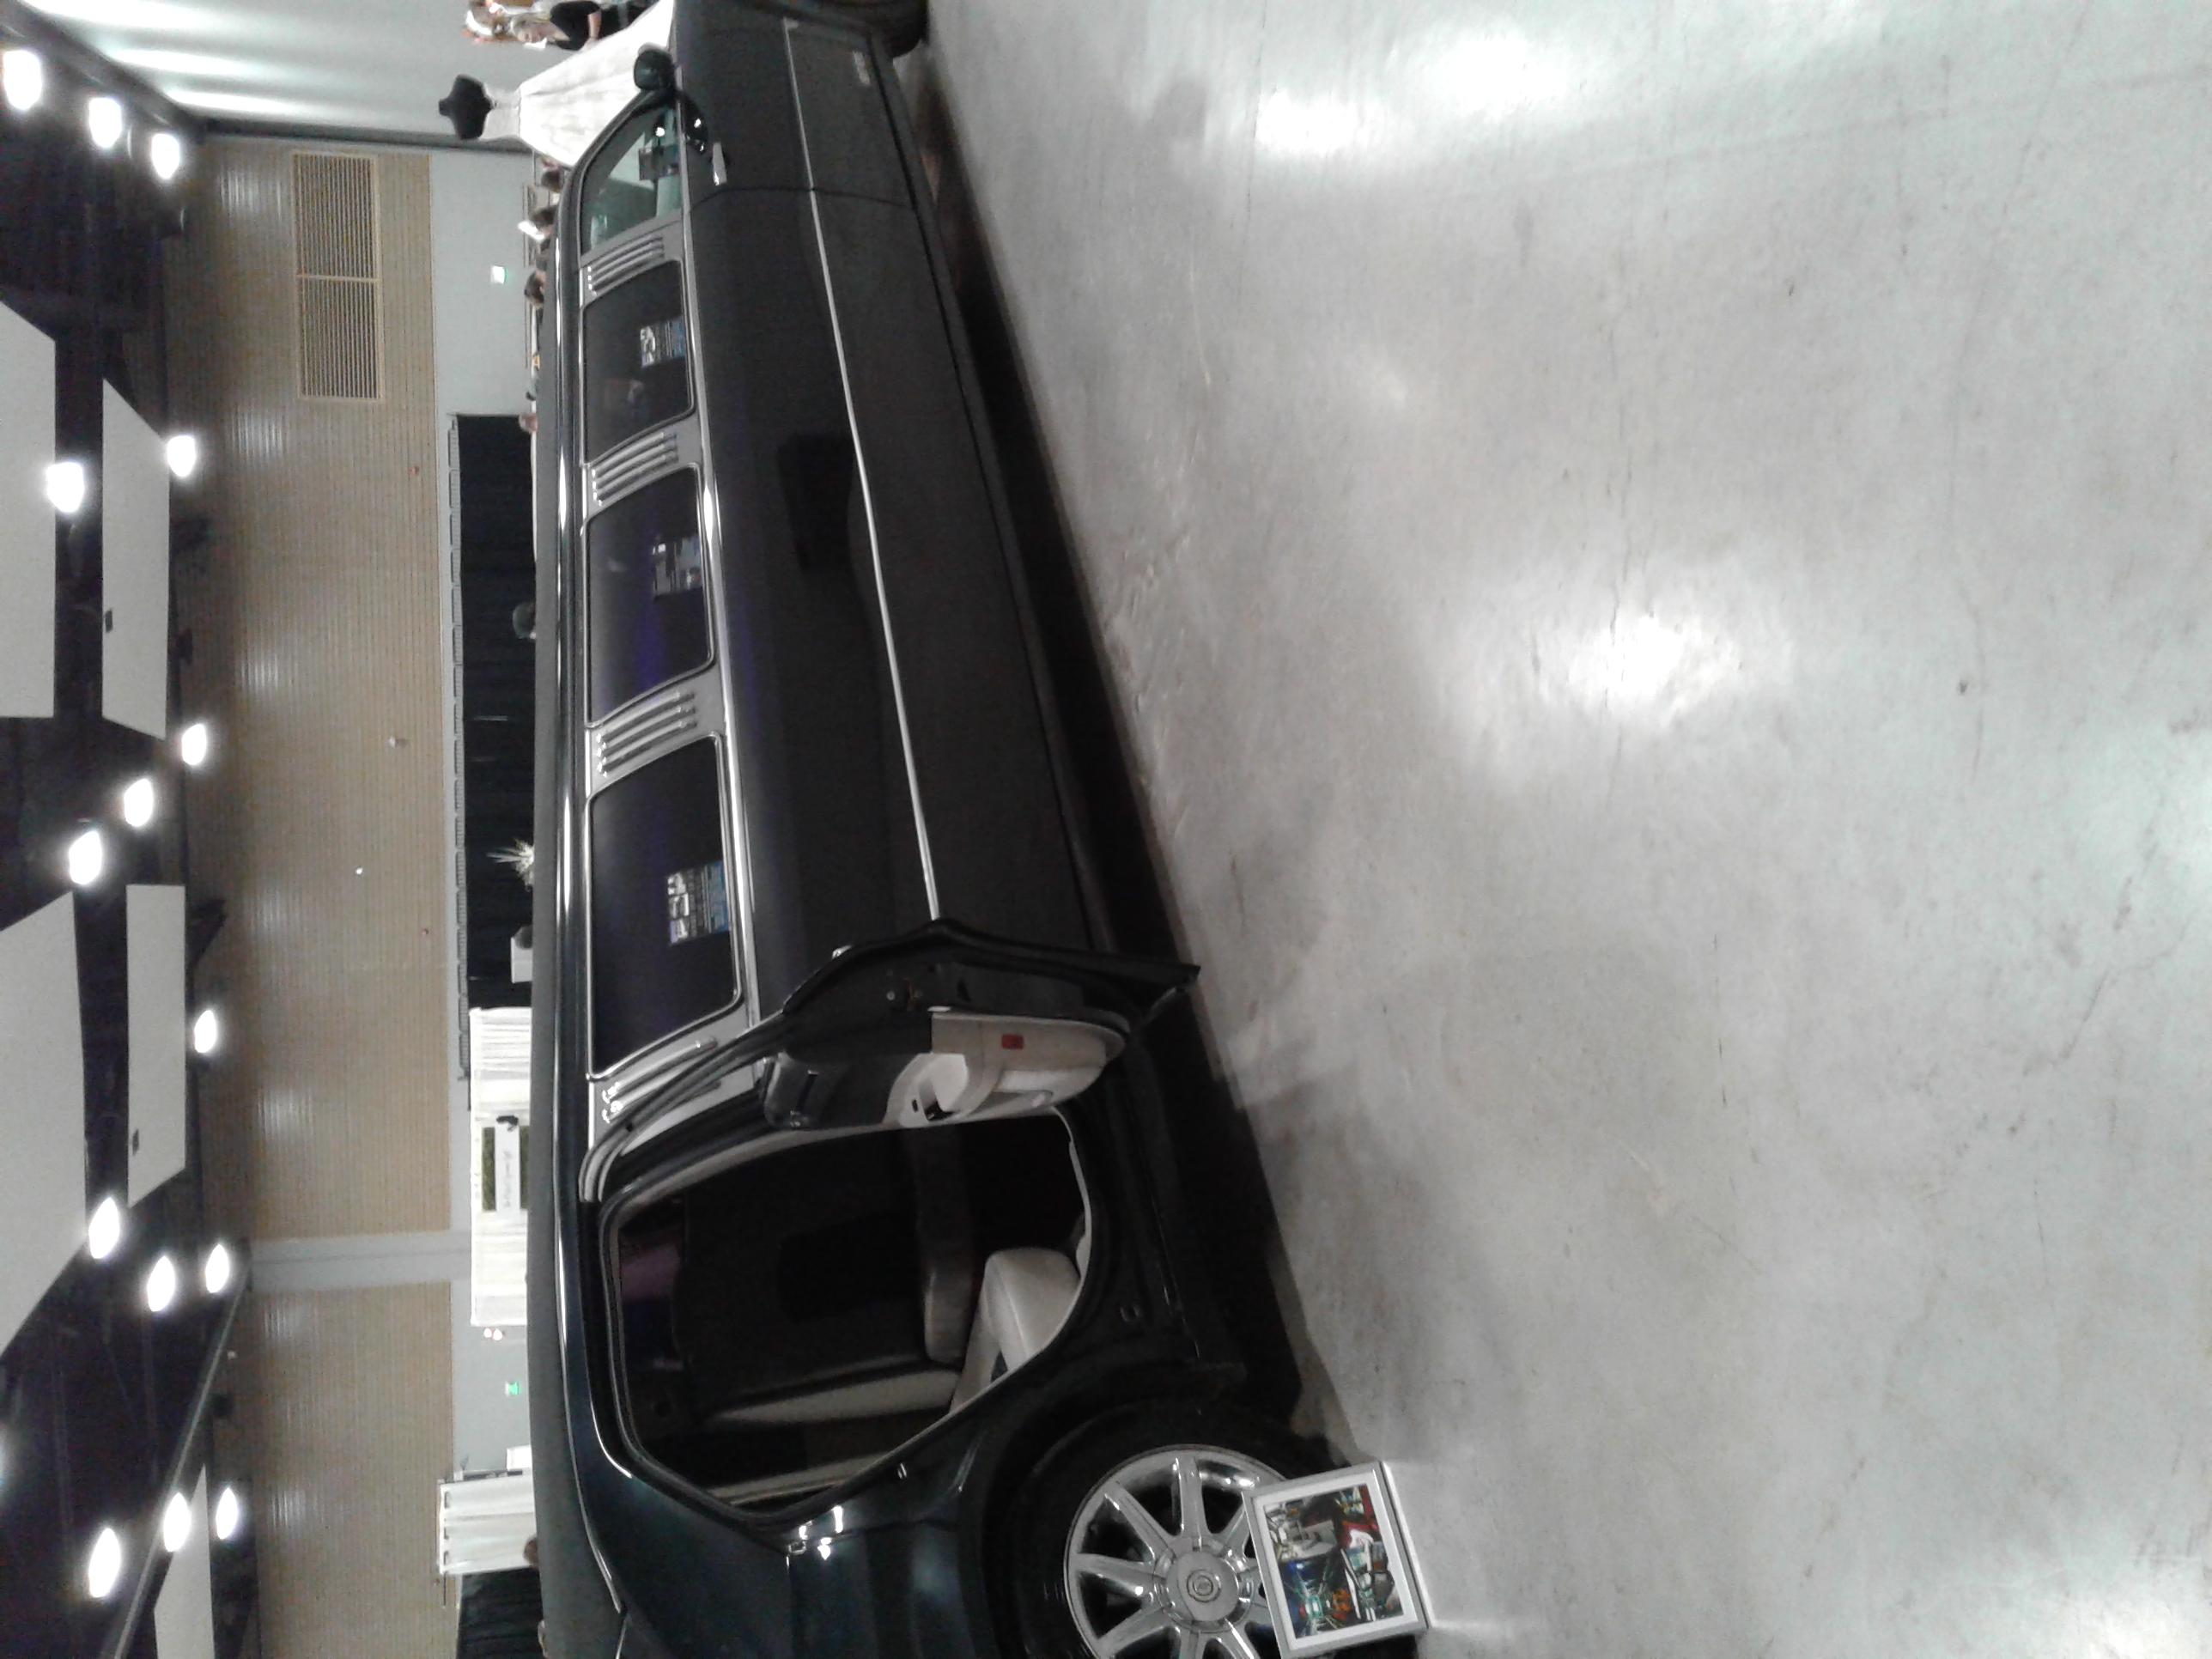 Chrysler 300 Limo - Showroom Floor